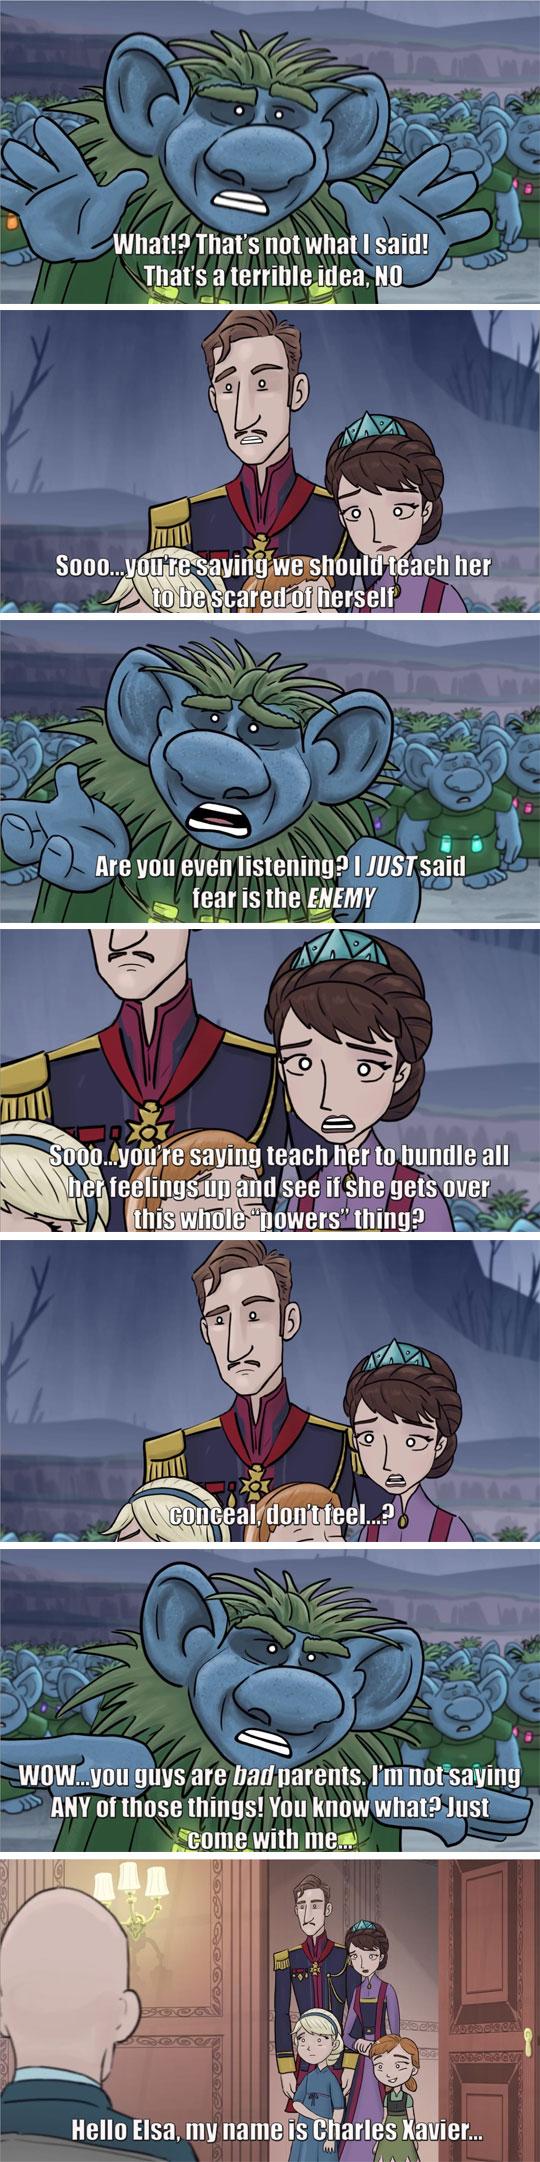 funny-Frozen-cartoon-ending-alternative-X-Men